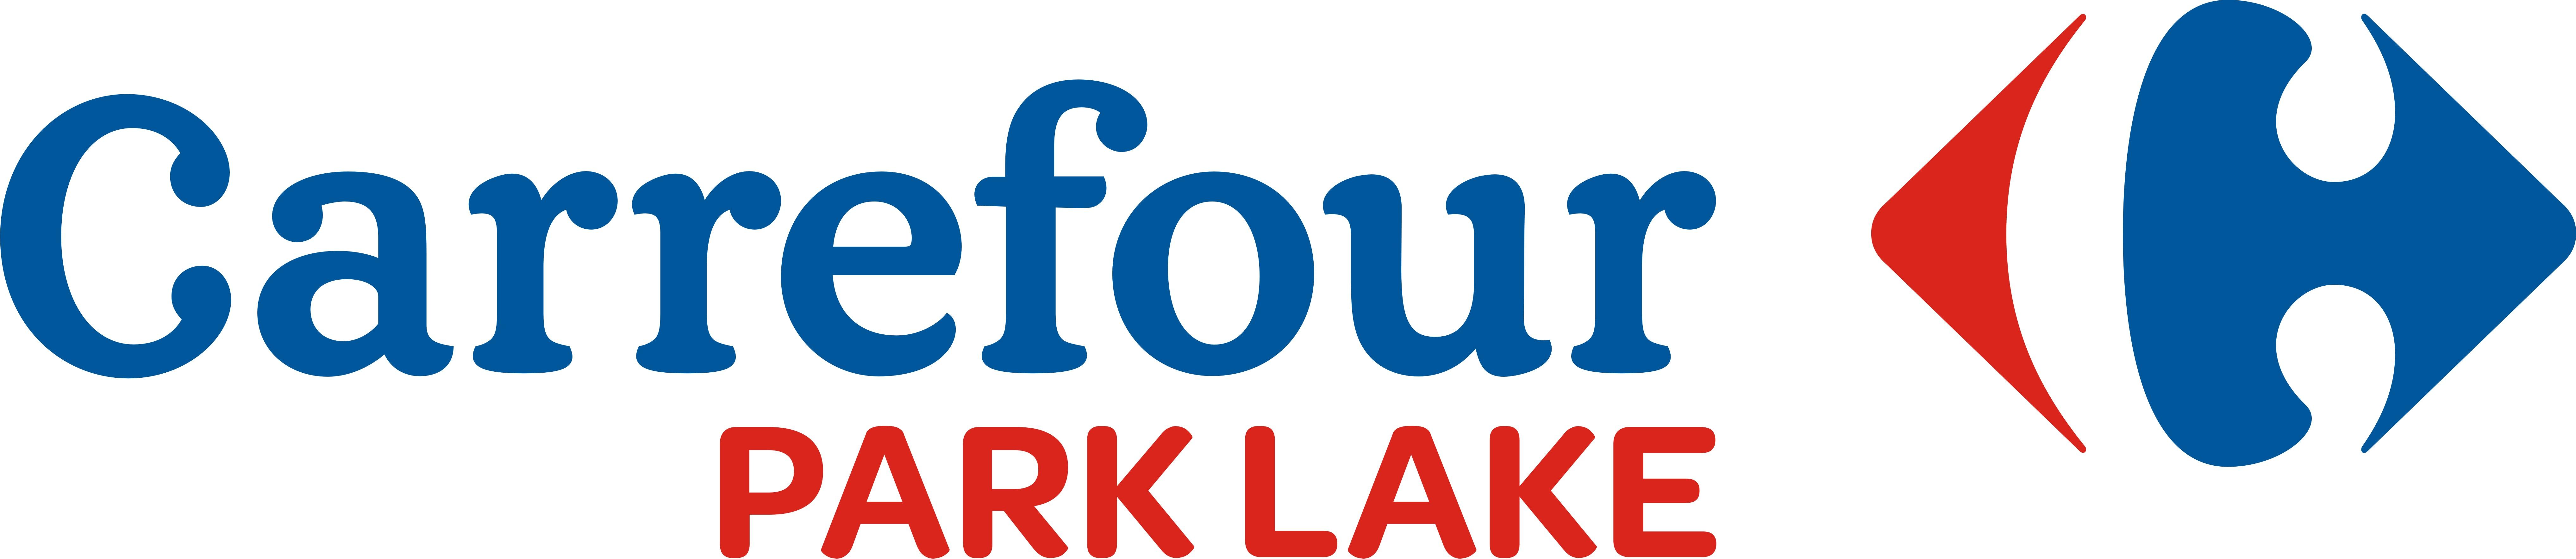 Carrefour ParkLake